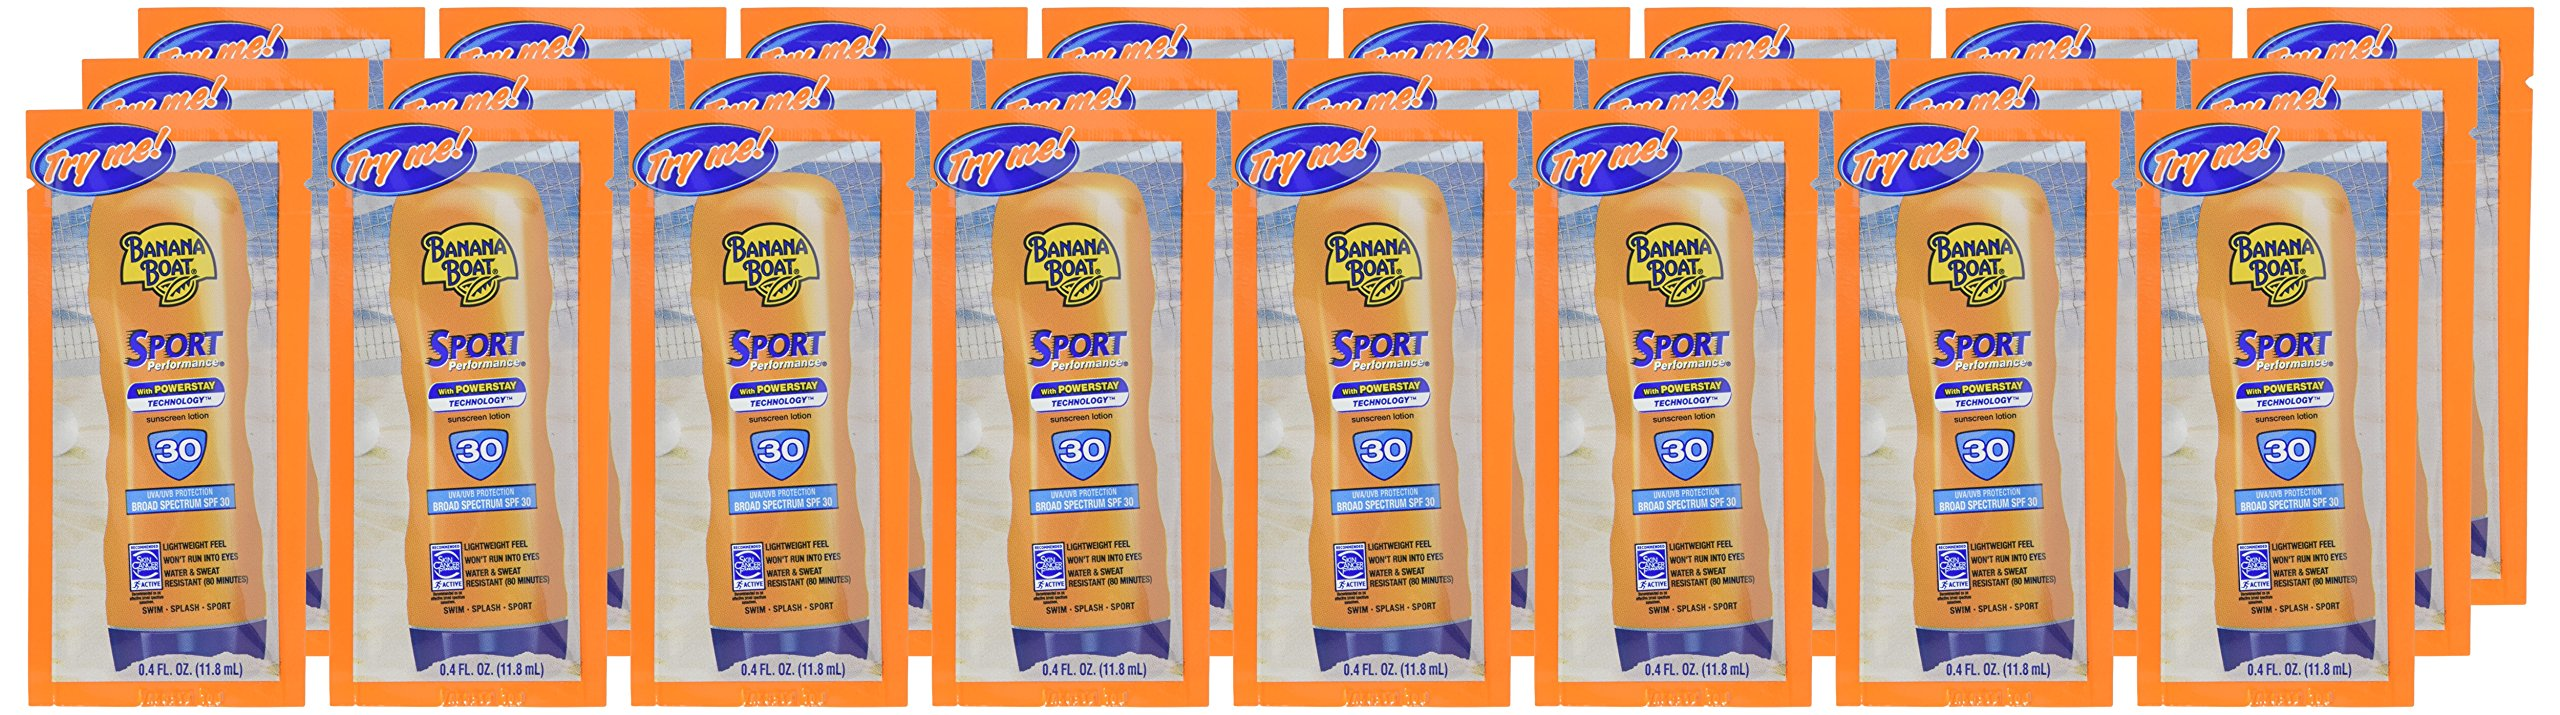 Banana Boat Sport Sunscreen, SPF 30 Protection lotion, Travel Packets 24 Packs by Banana Boat (Image #2)